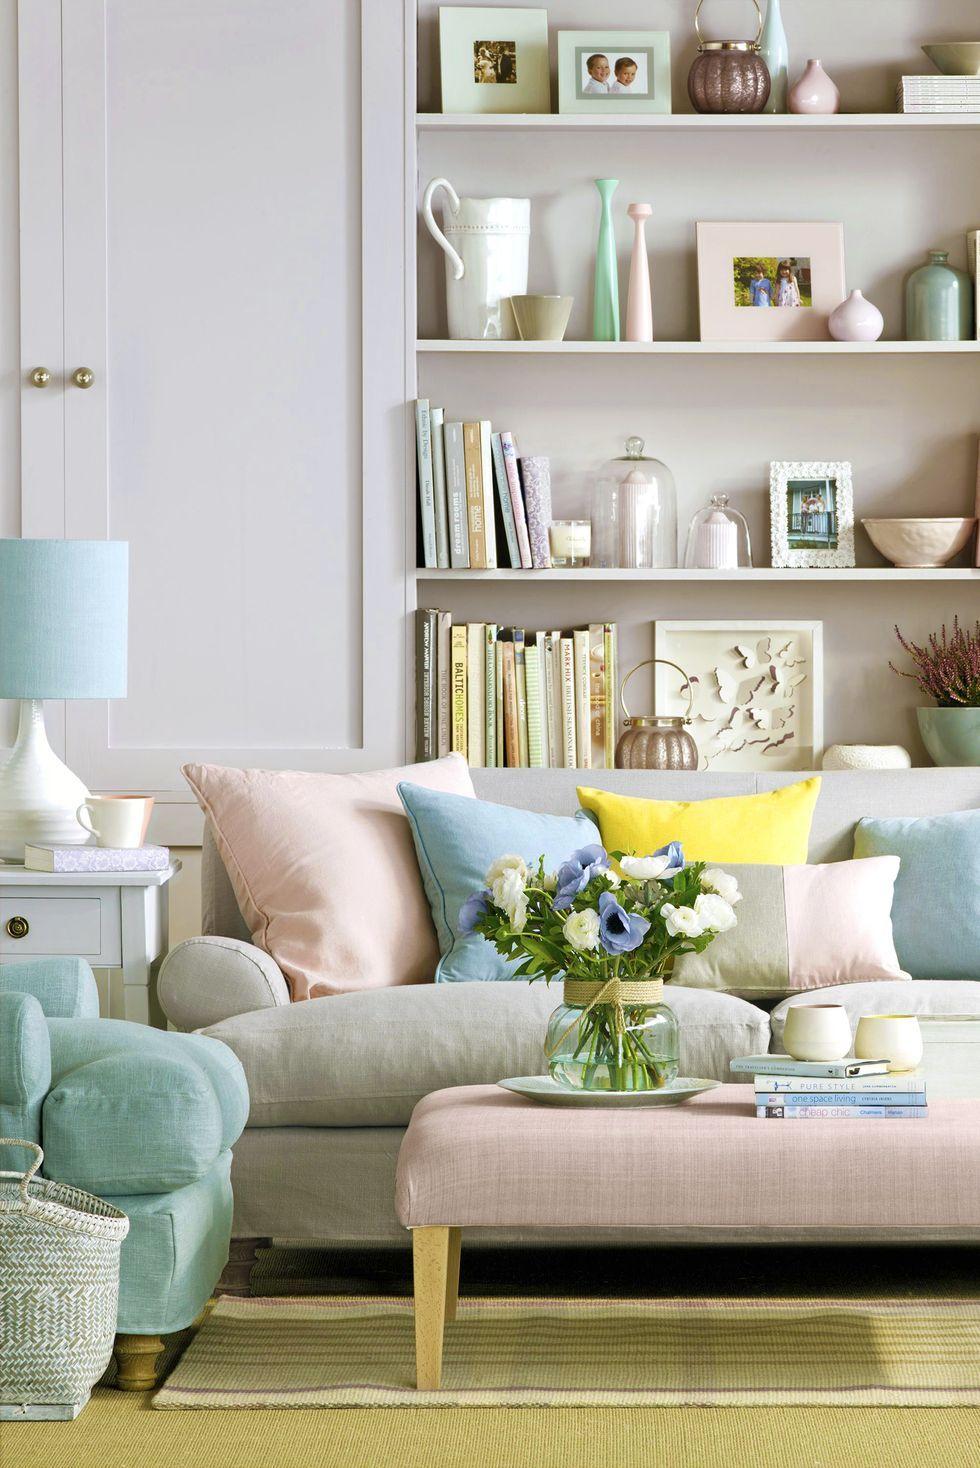 20 Chic Bookshelf Decorating Ideas   How to Decorate Bookshelves